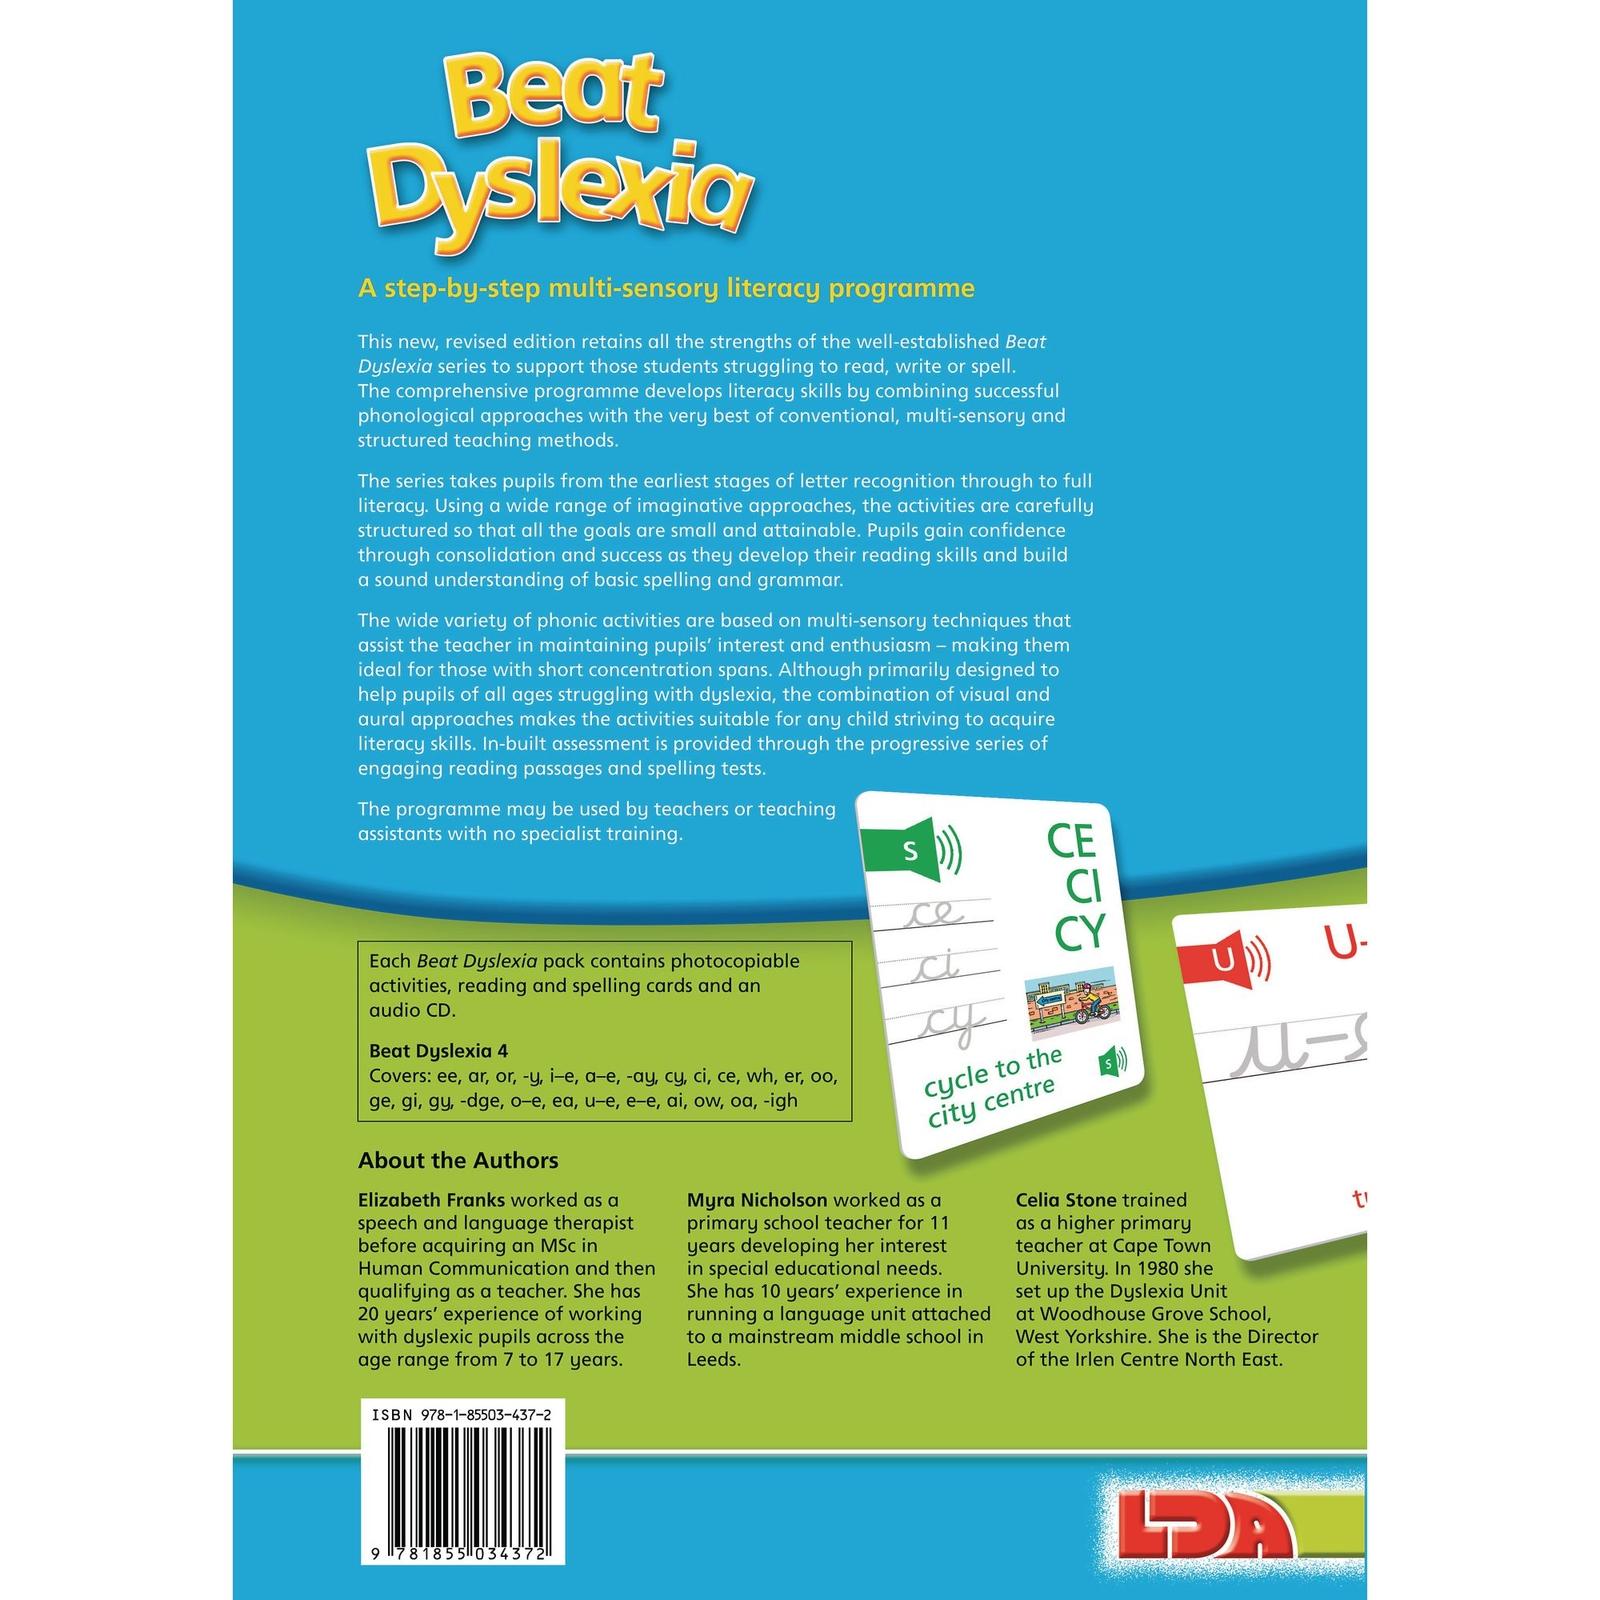 Product | LDA Resources